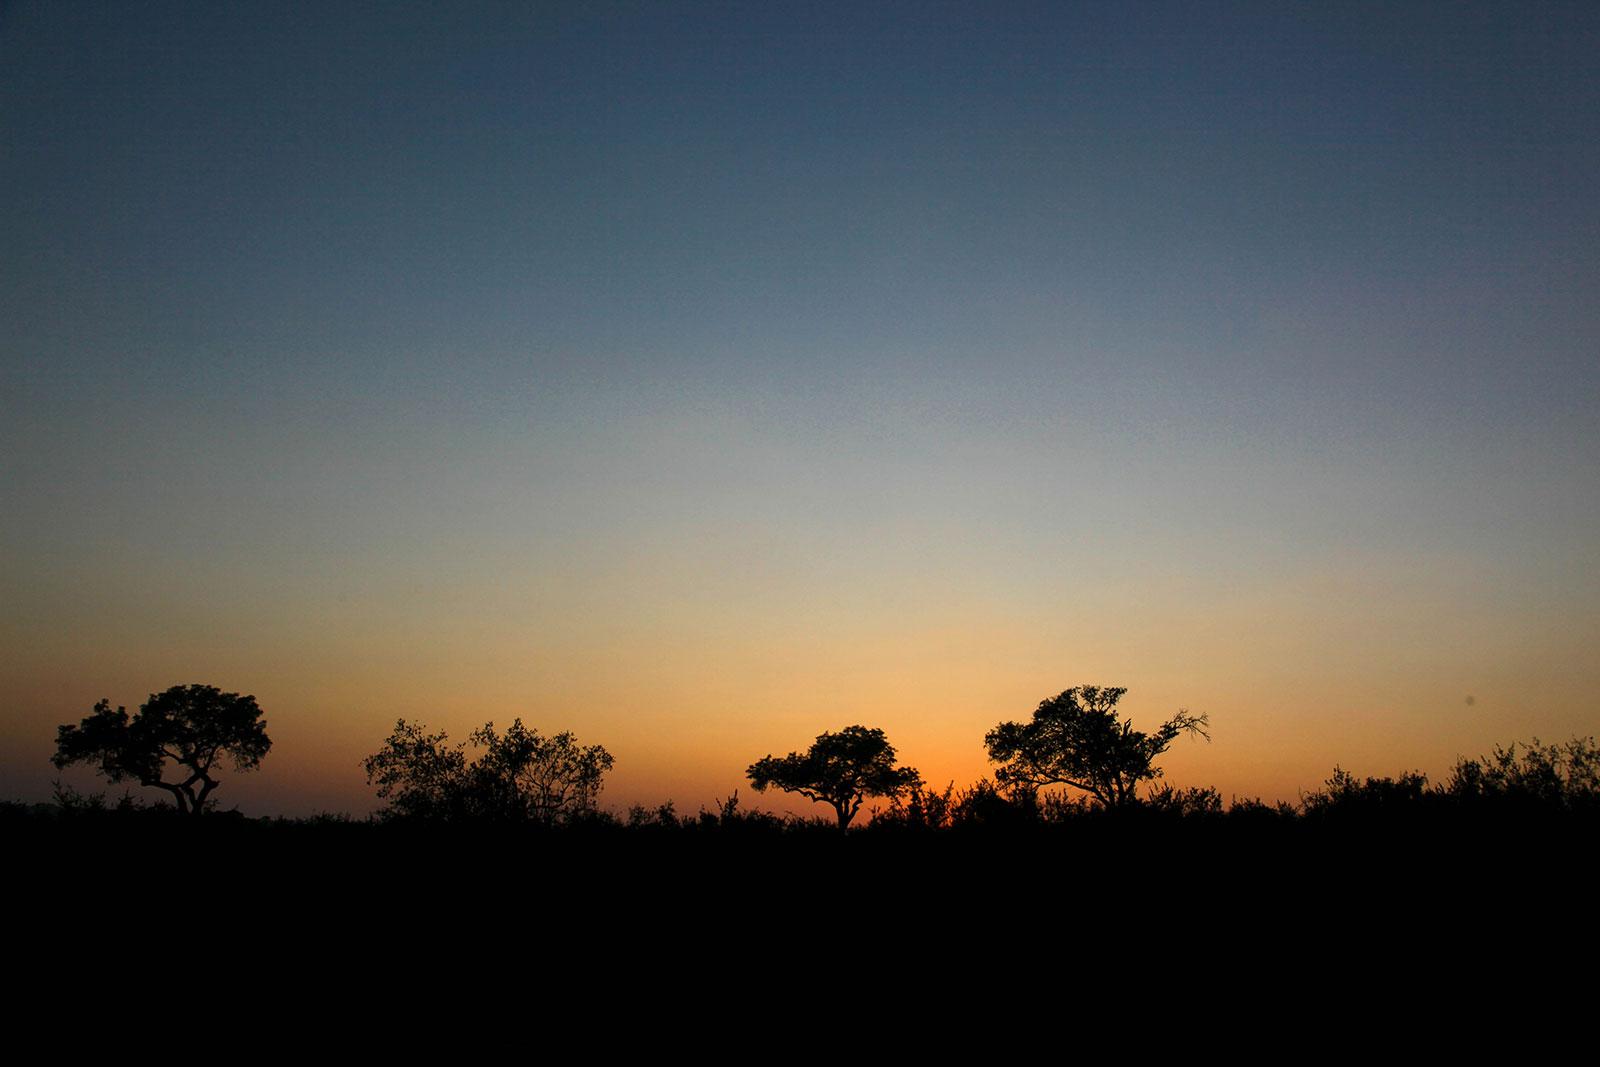 countryside, interior, at dusk